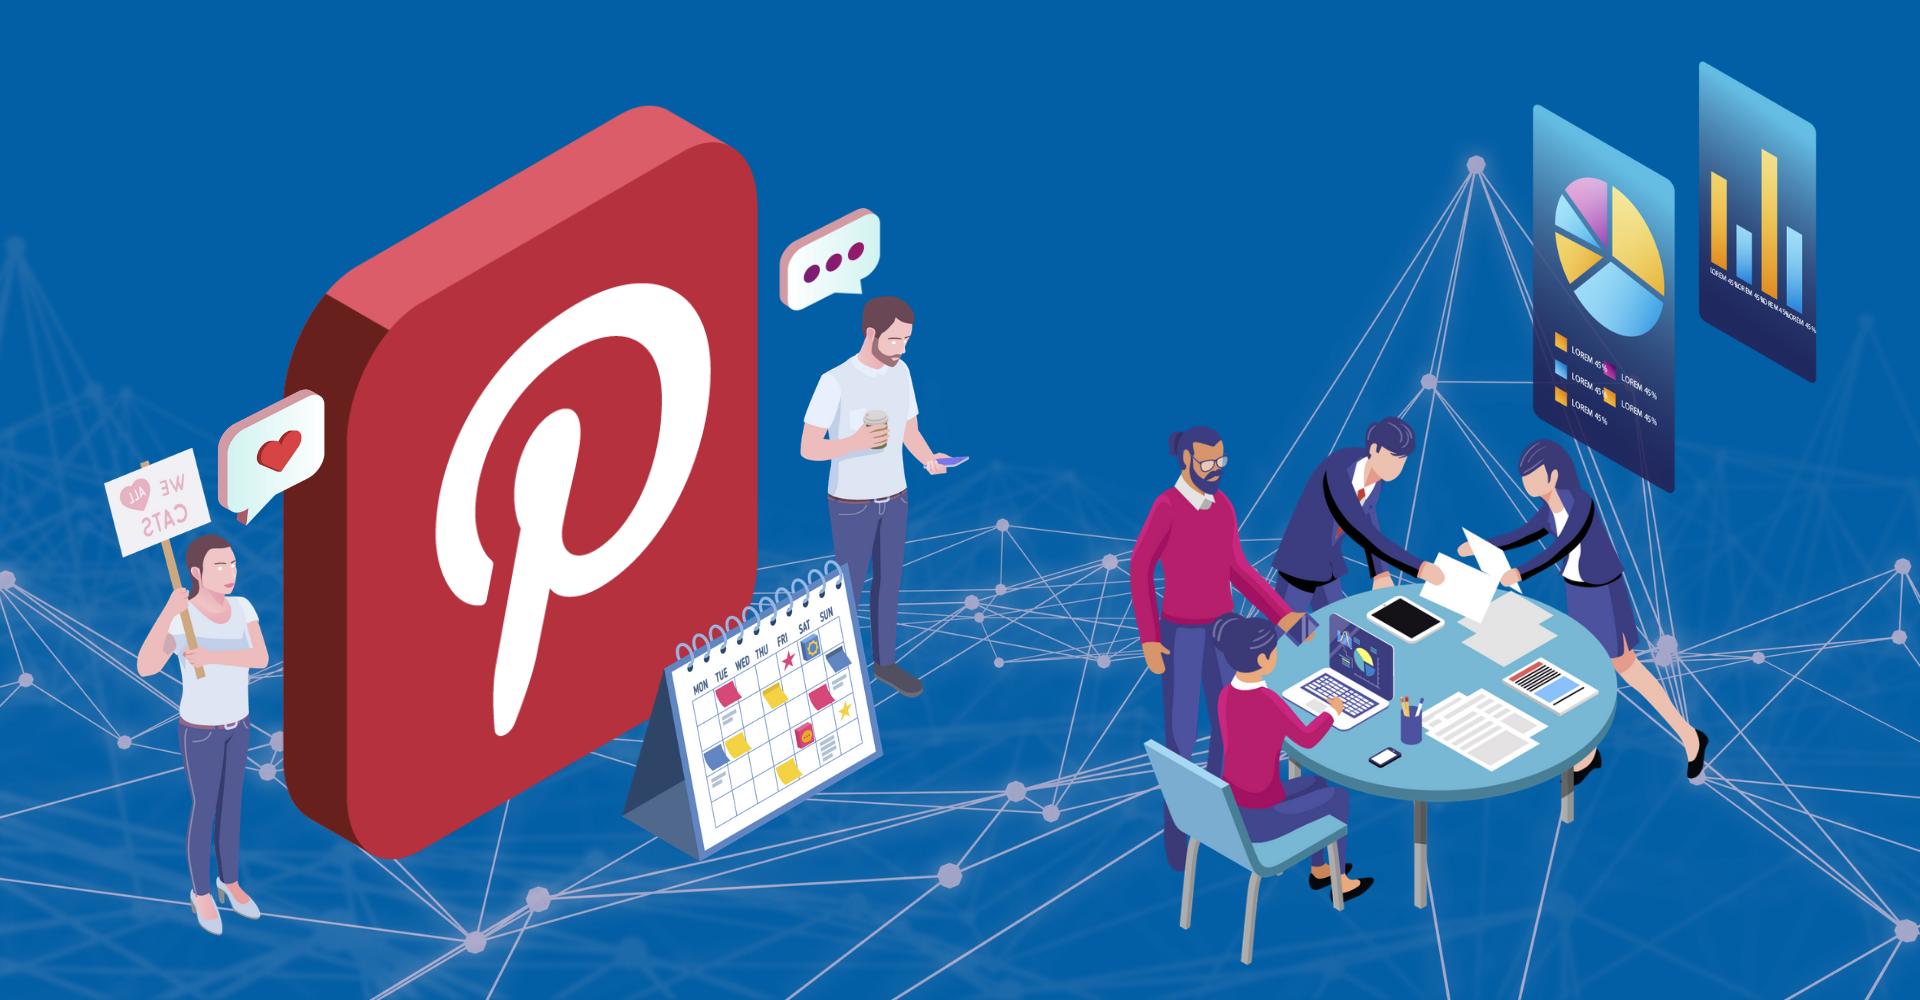 Top 9 Pinterest Marketing Tips